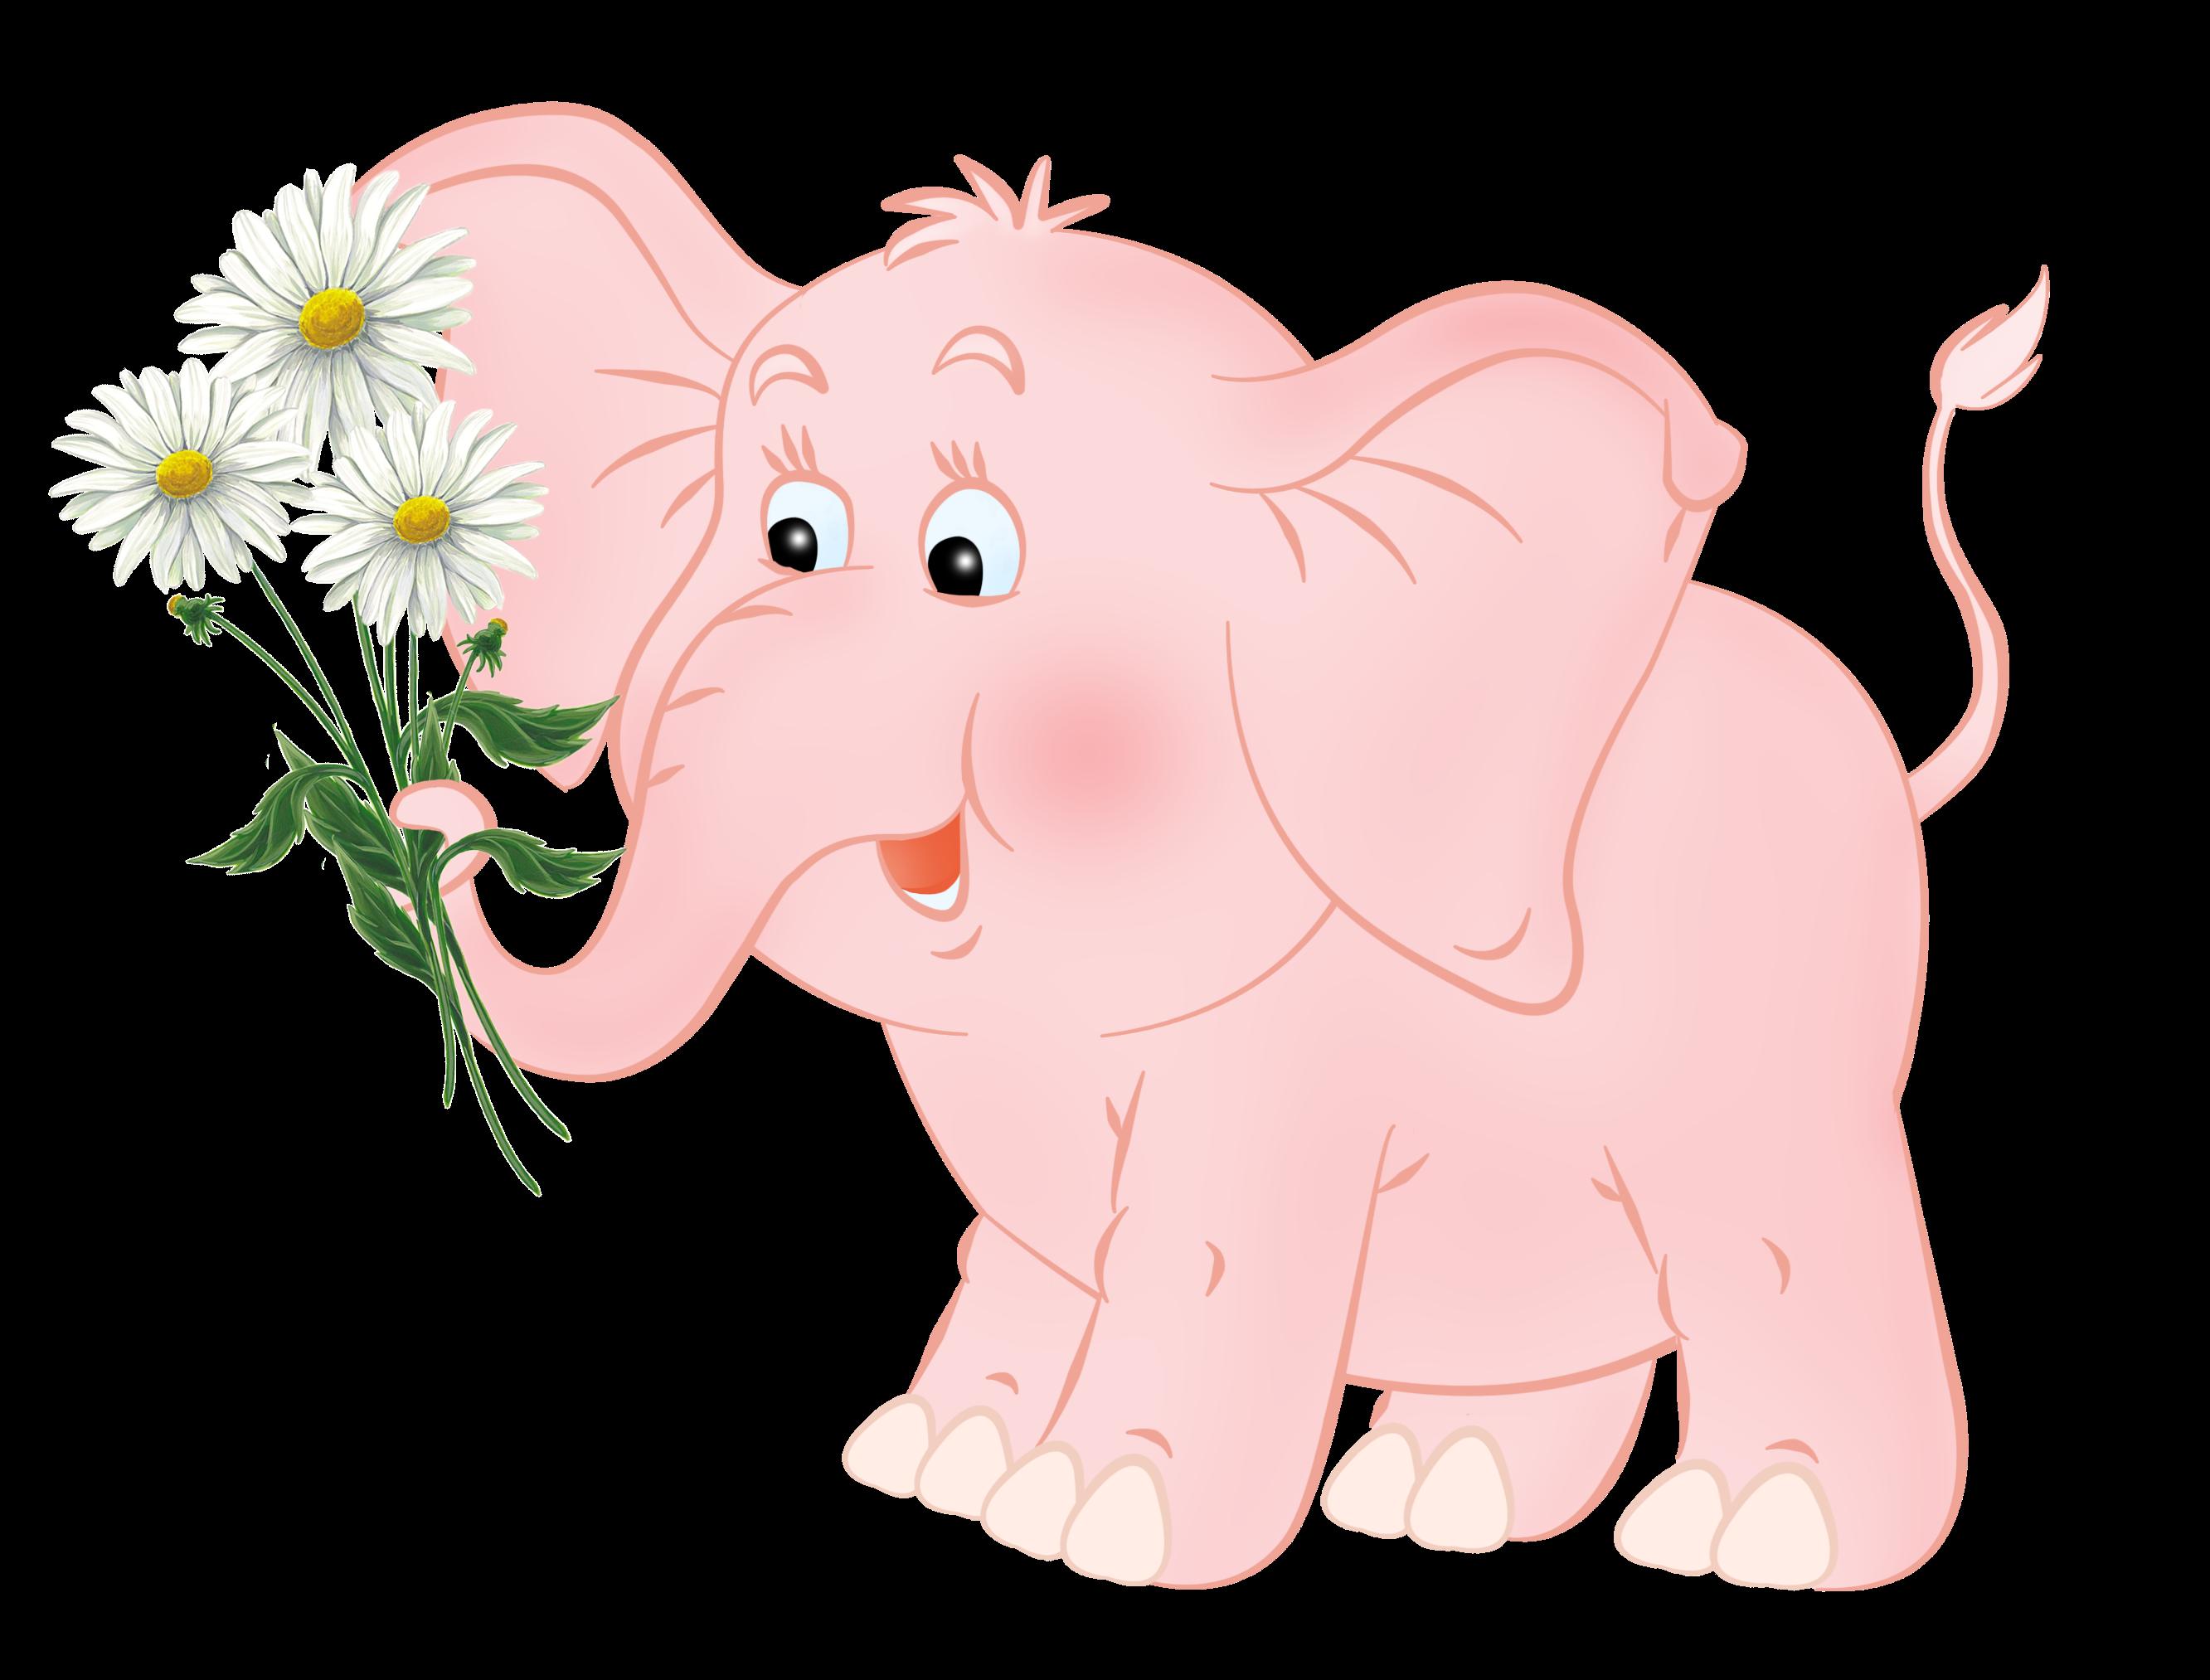 Картинка слона розового